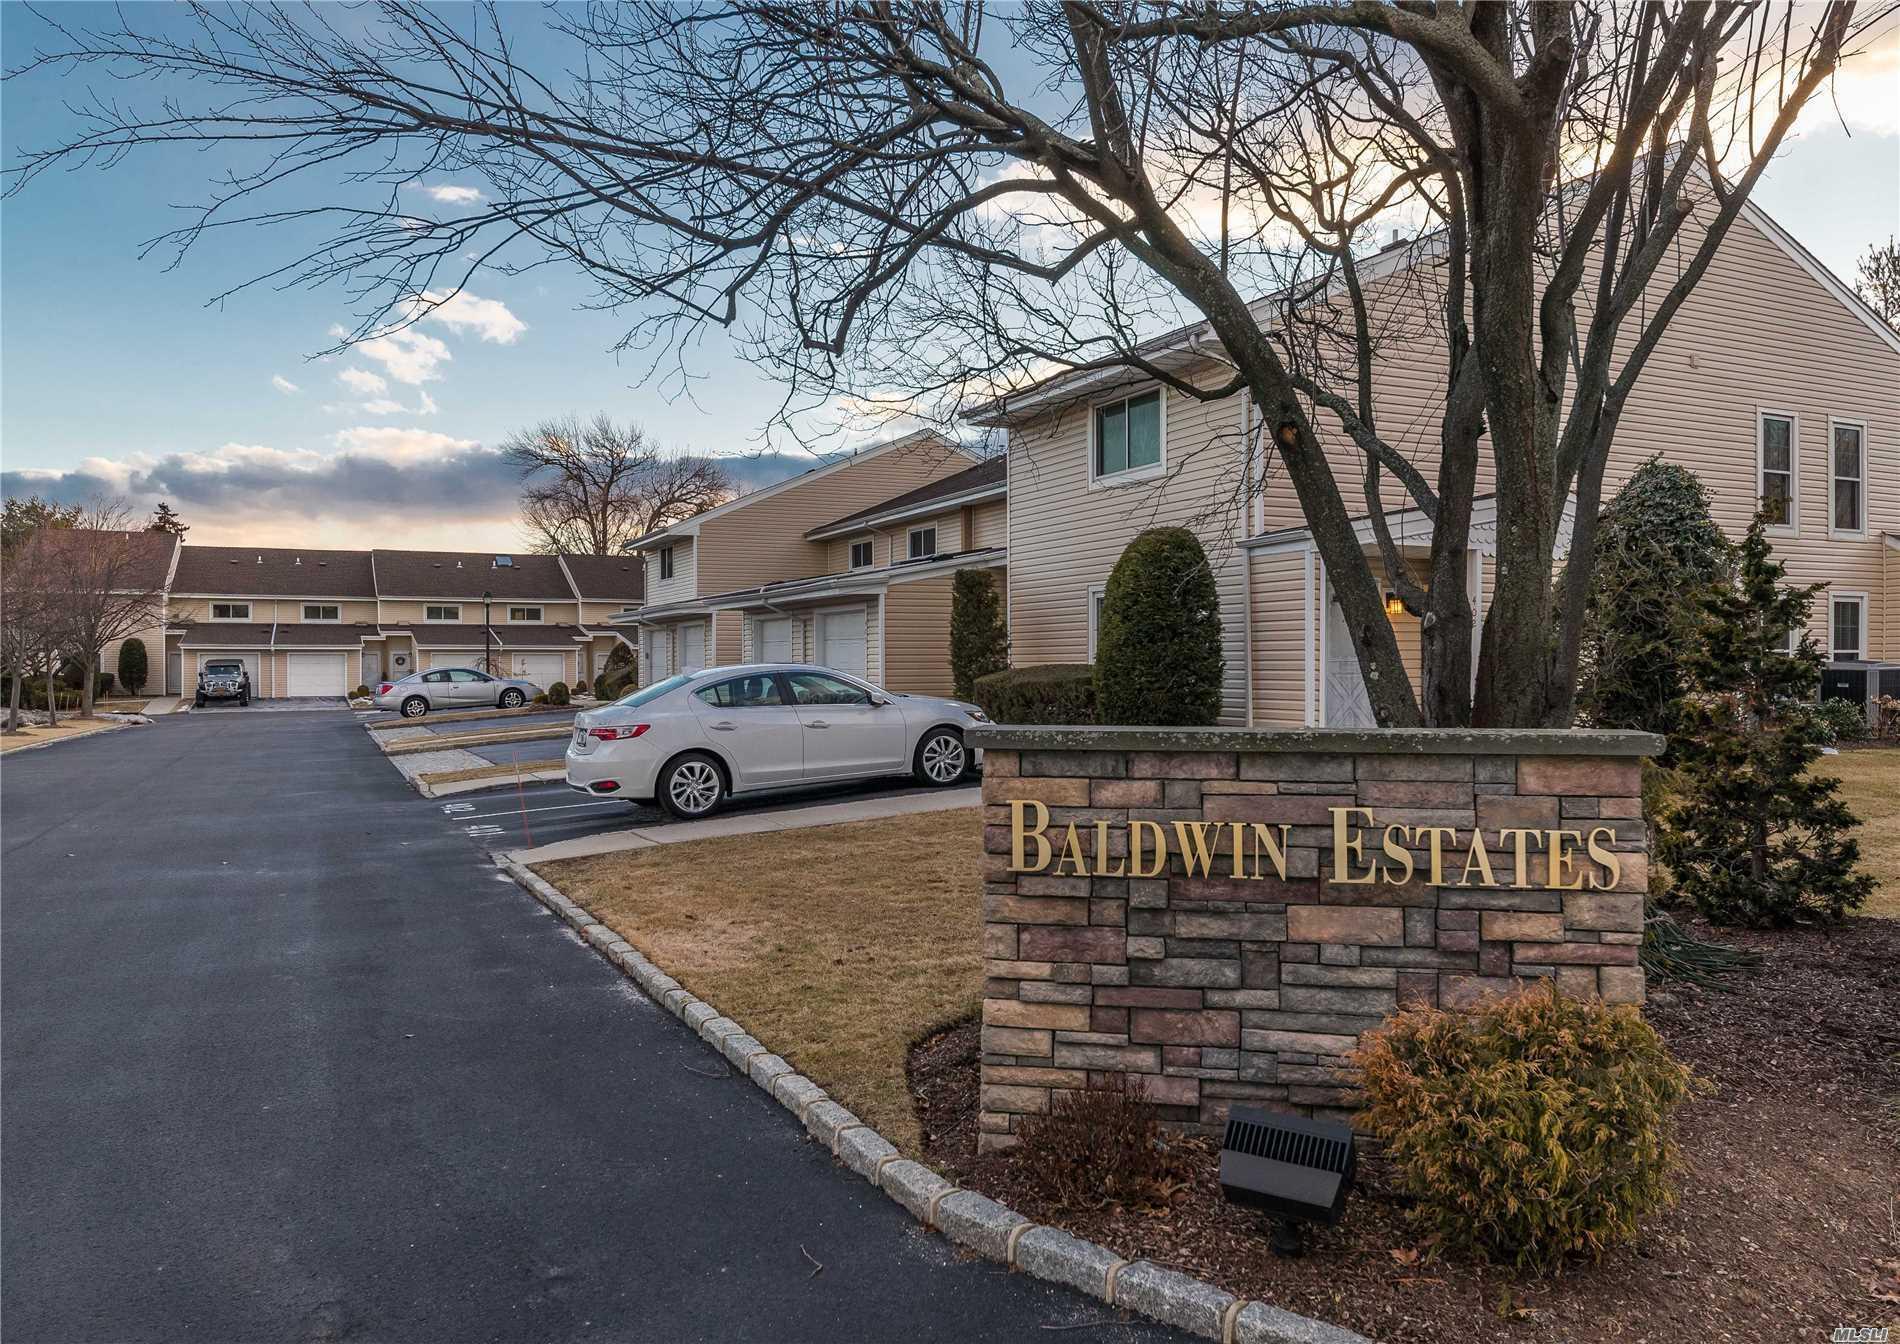 2355 Pershing Blvd #511, Baldwin, NY | MLS# 3002808 | Hal